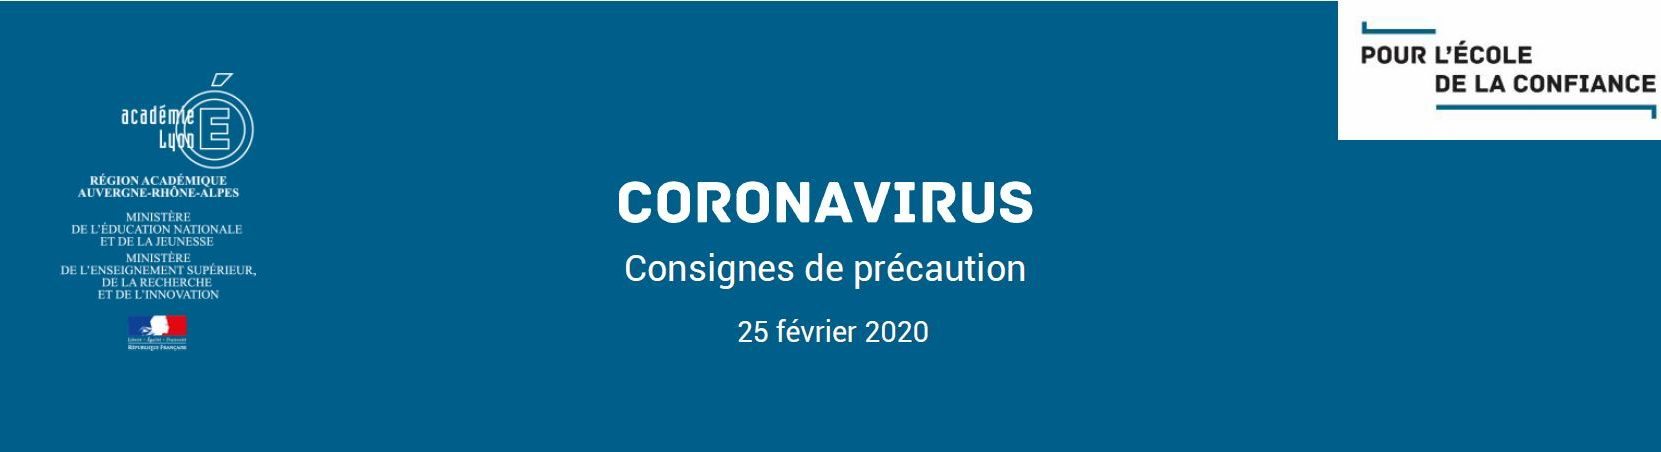 Bandeau Coronavirus 250220.JPG